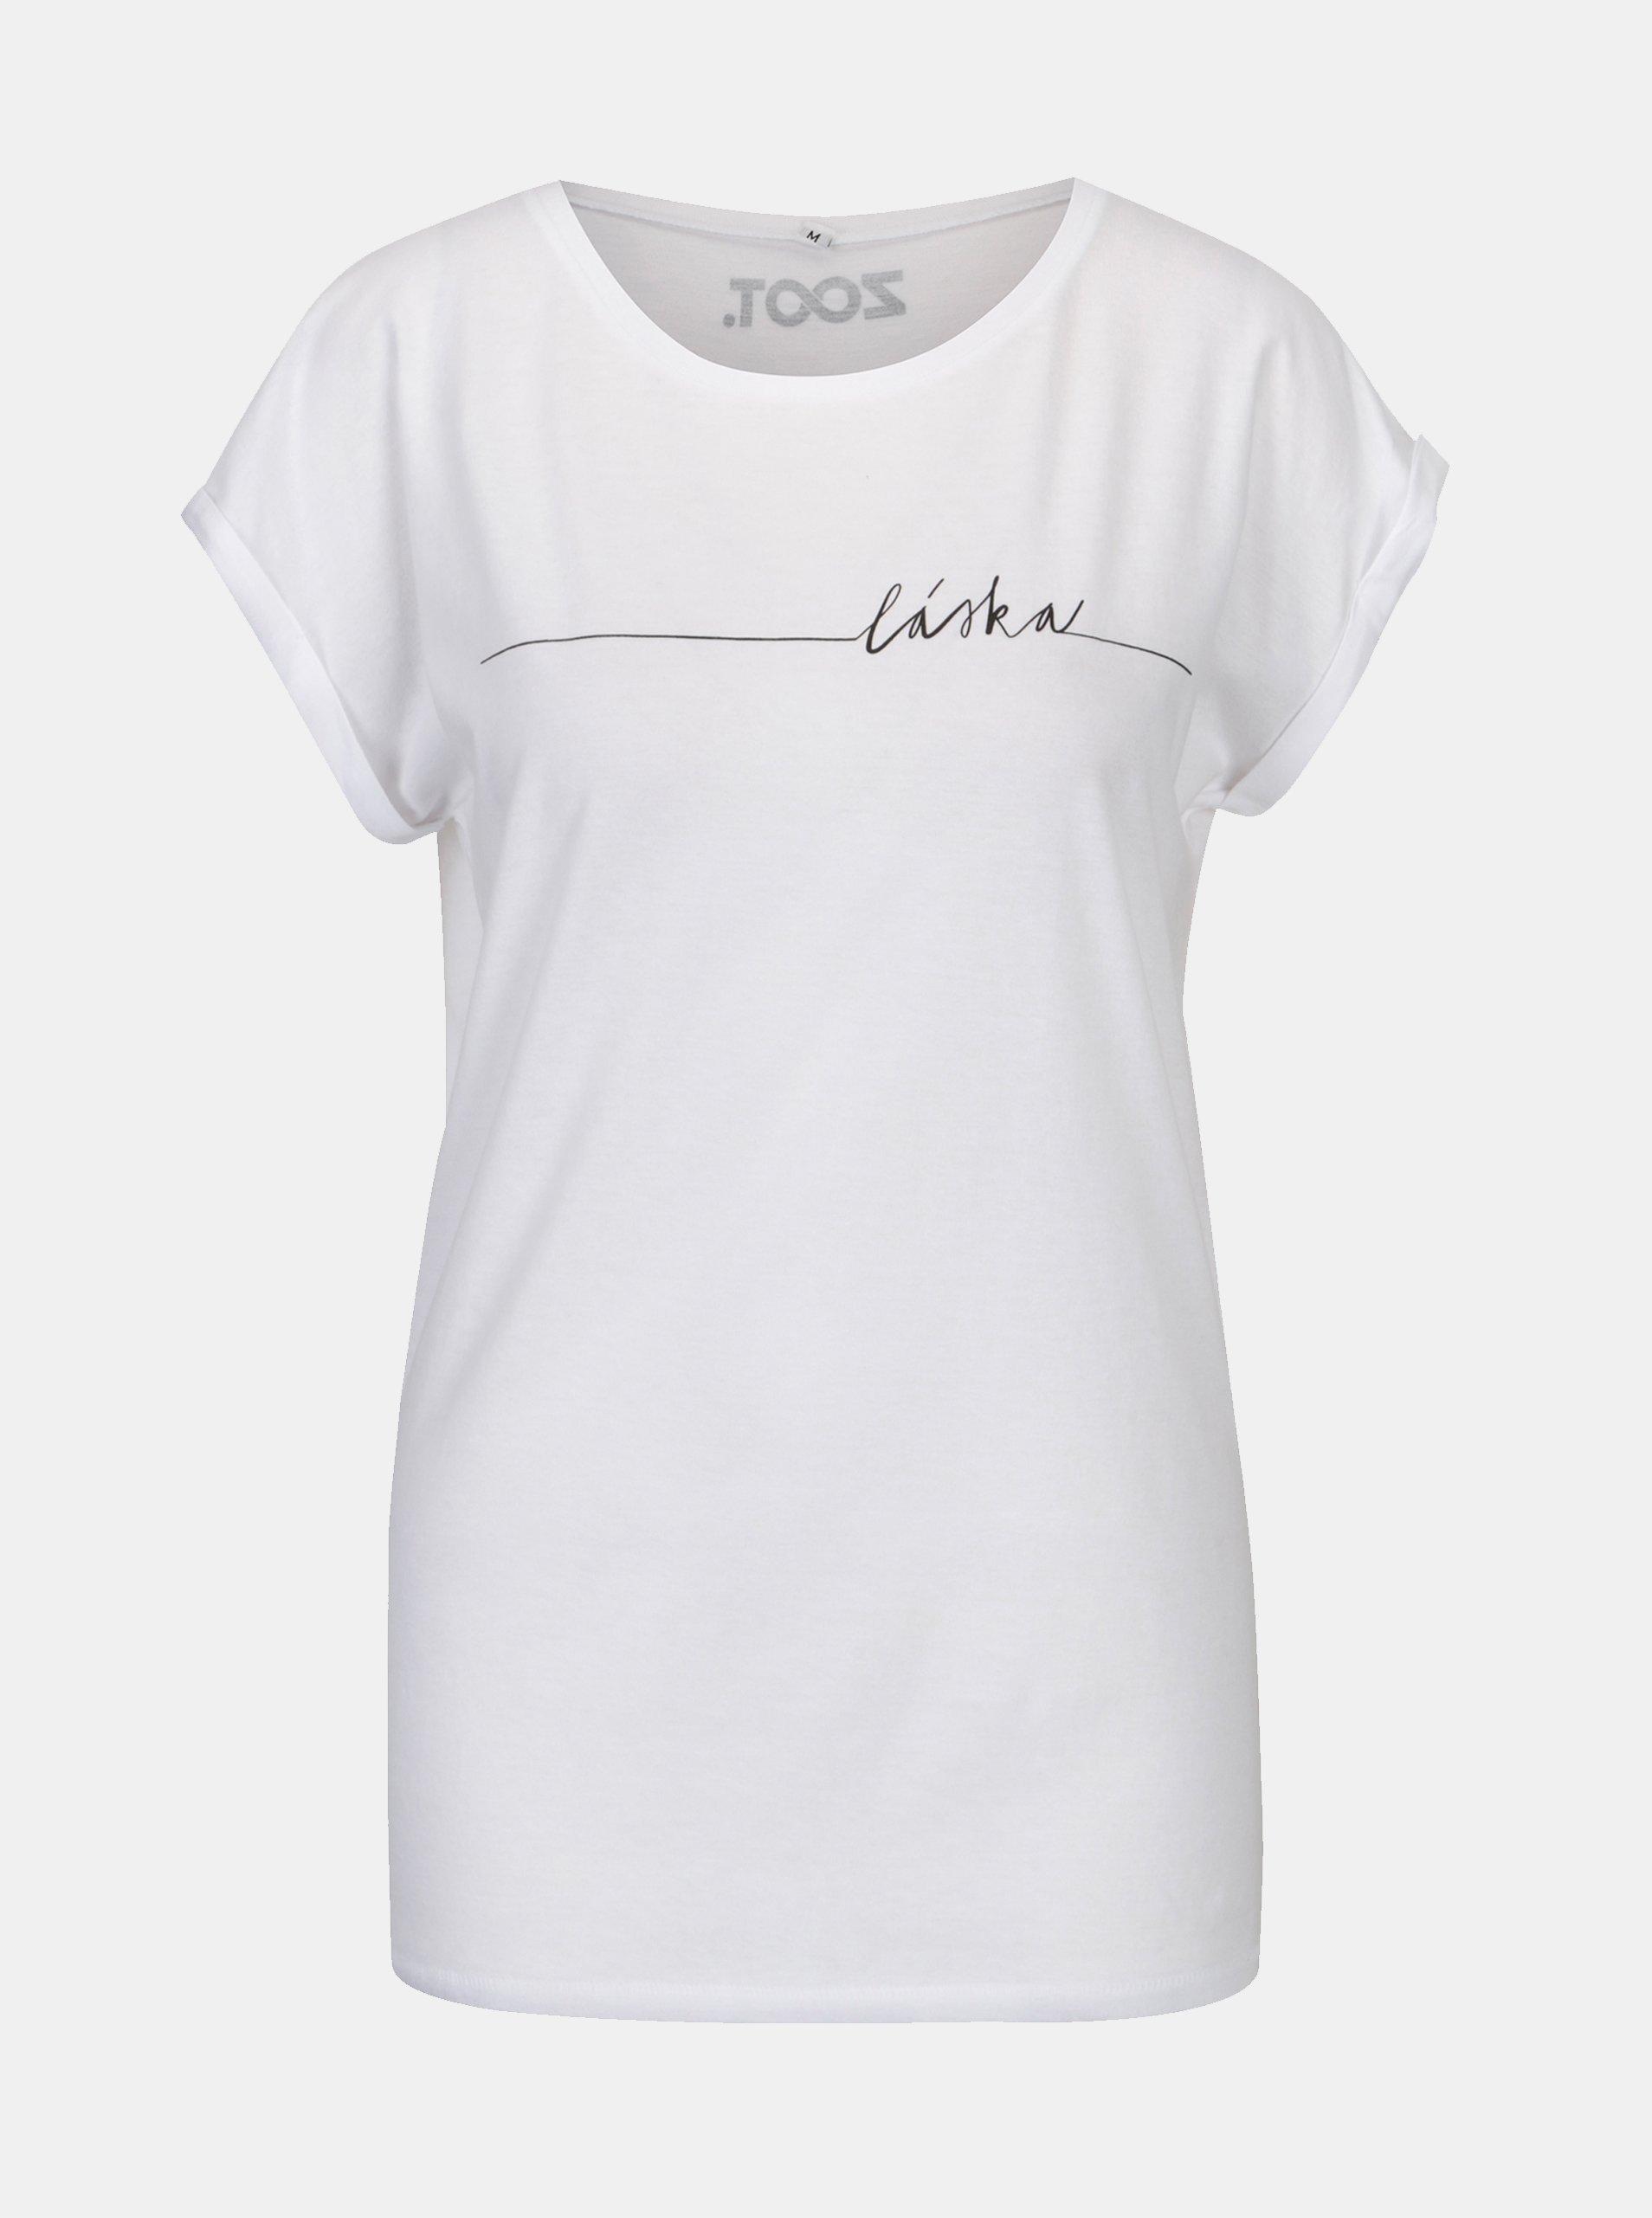 511813254a1a Bílé dámské tričko s potiskem ZOOT Original Láska